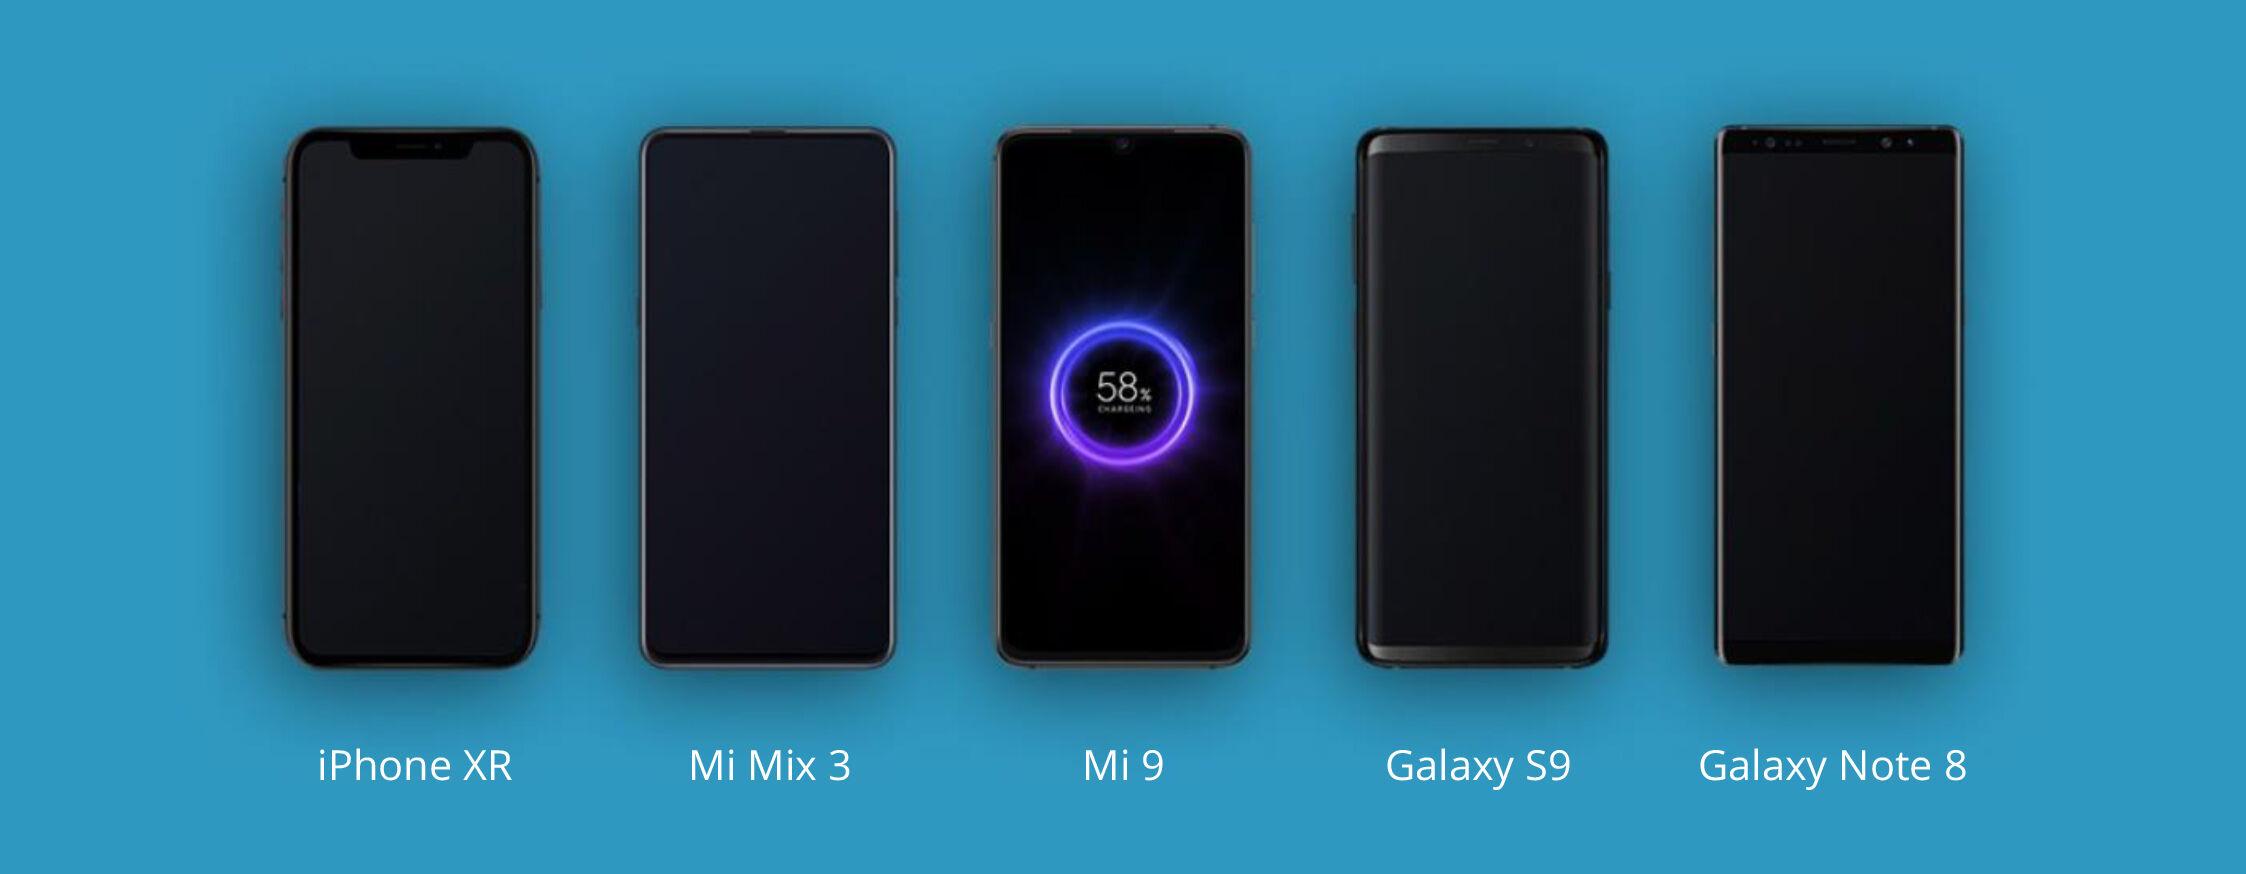 xiaomi-10000-mah-mi-wireless-power-bank-essential-t11